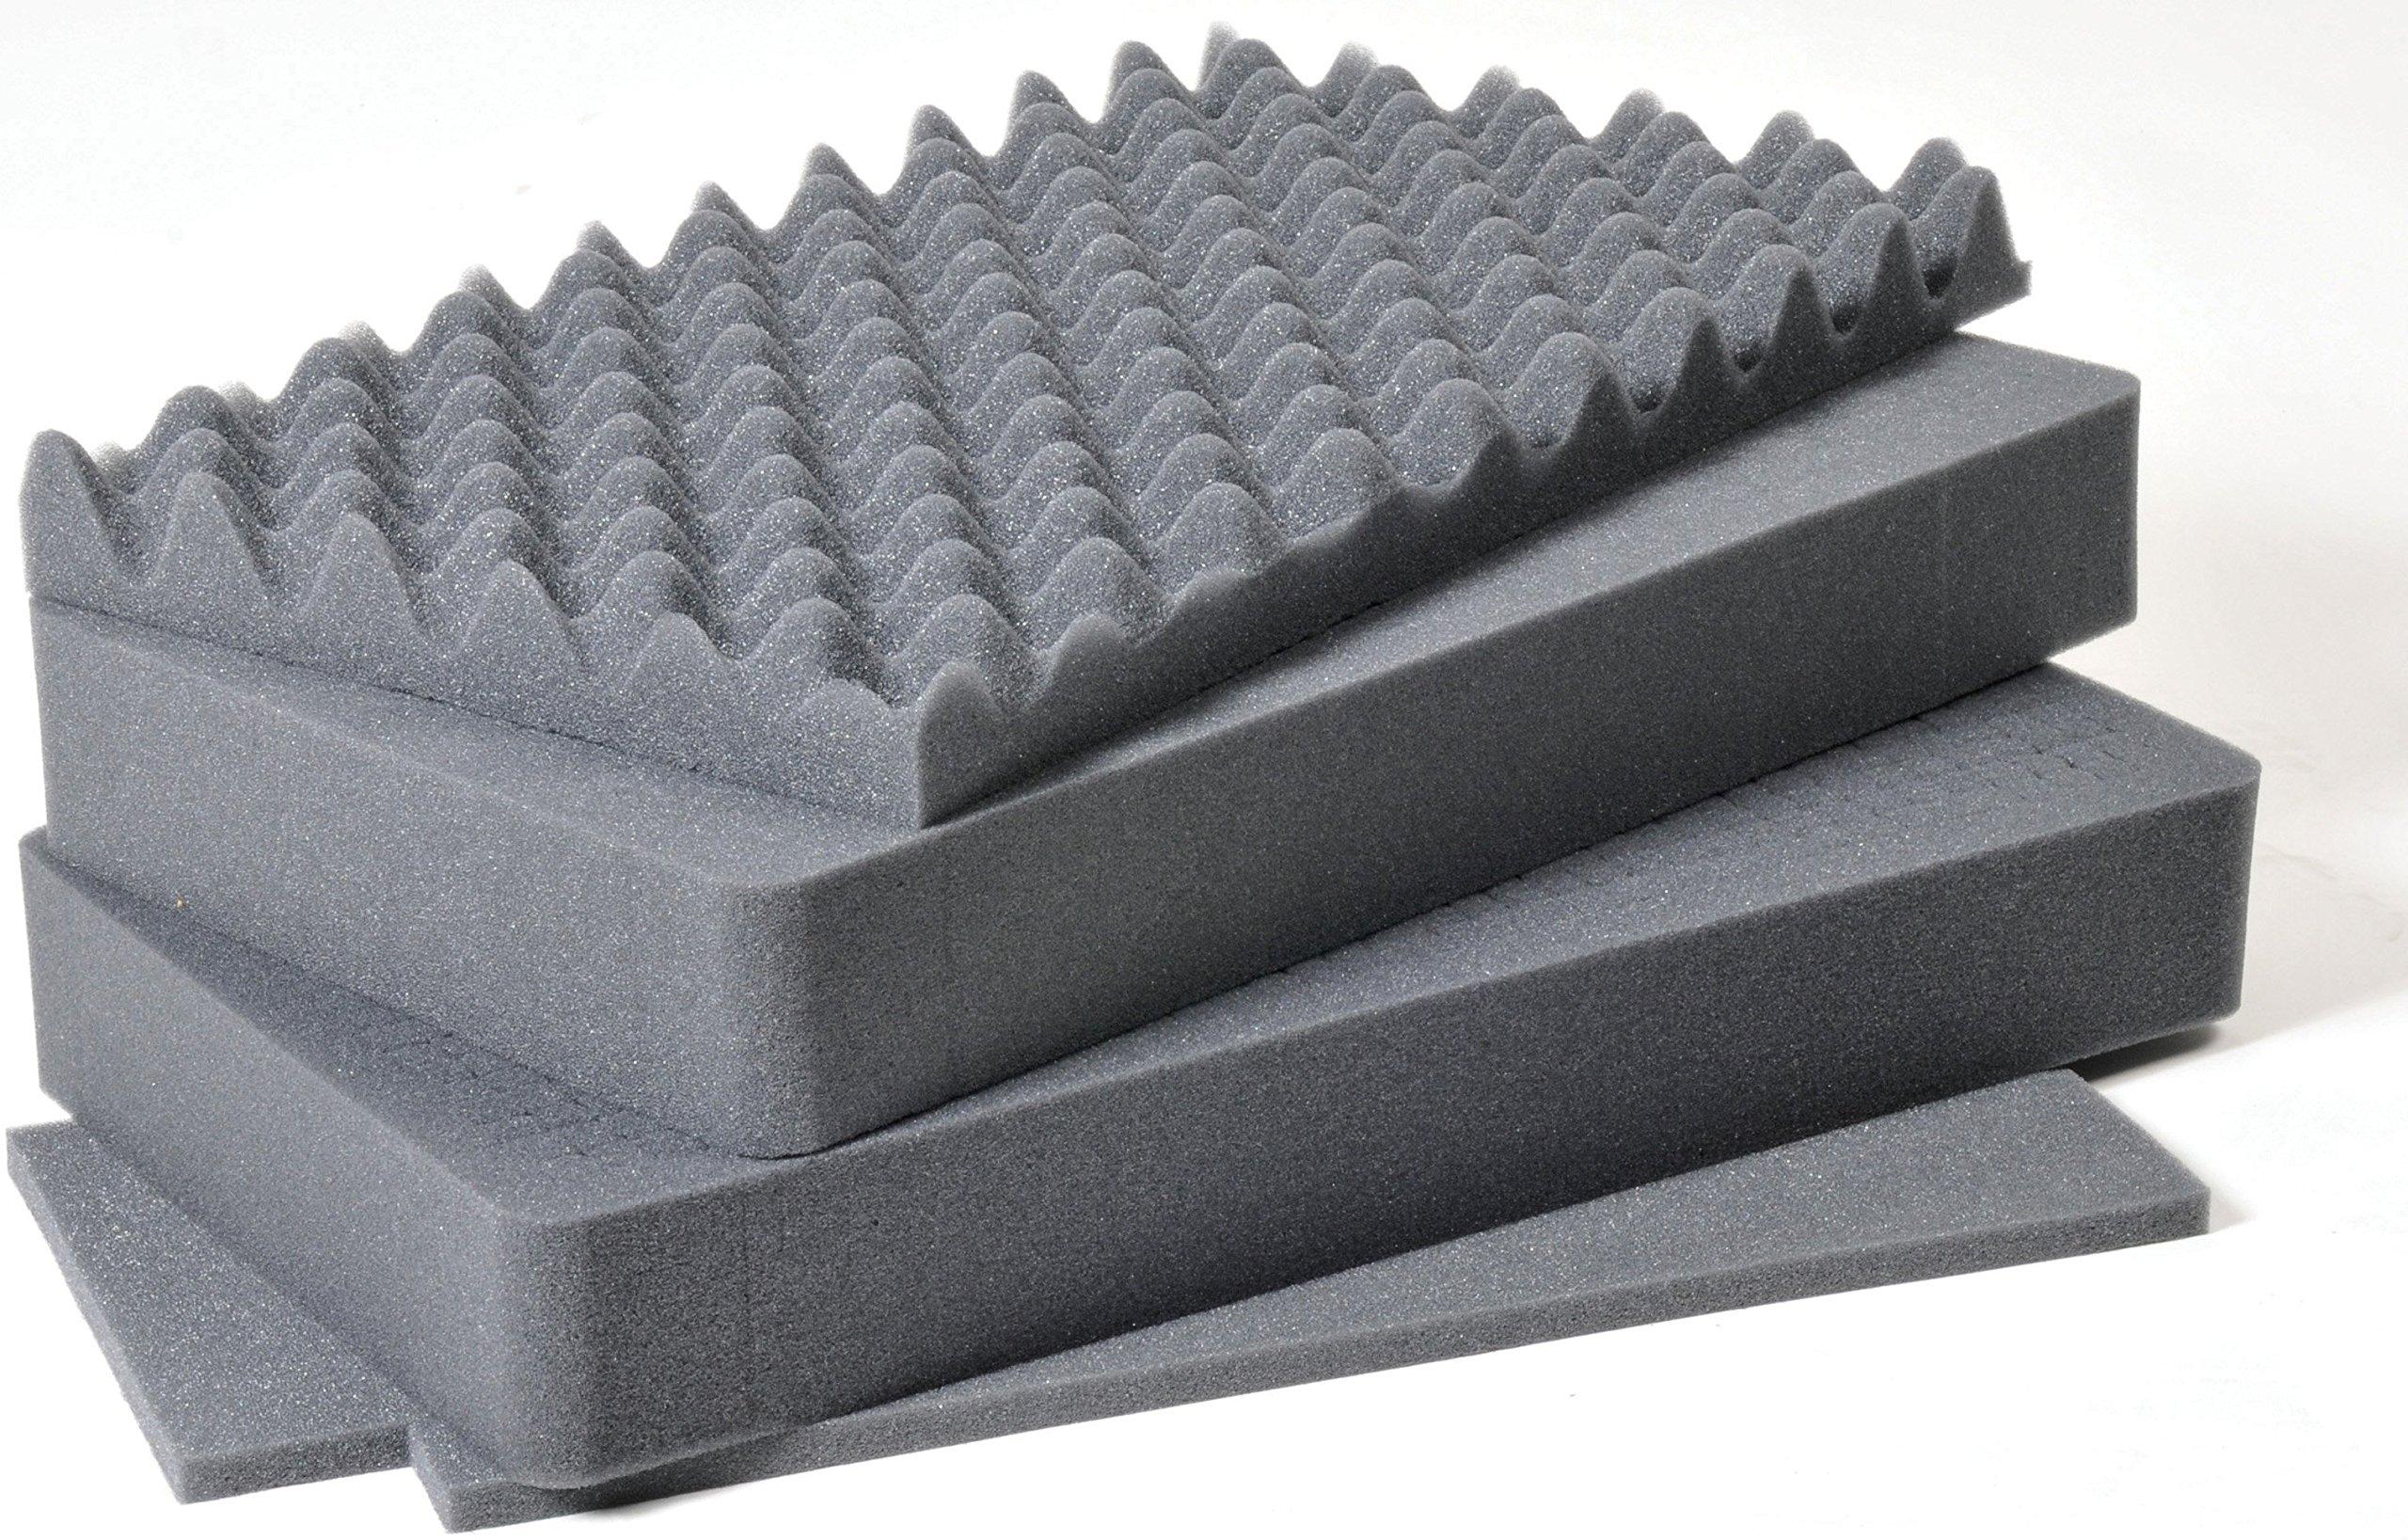 Seahorse SE830 Replacement foam set by CVPKG by Seahorse